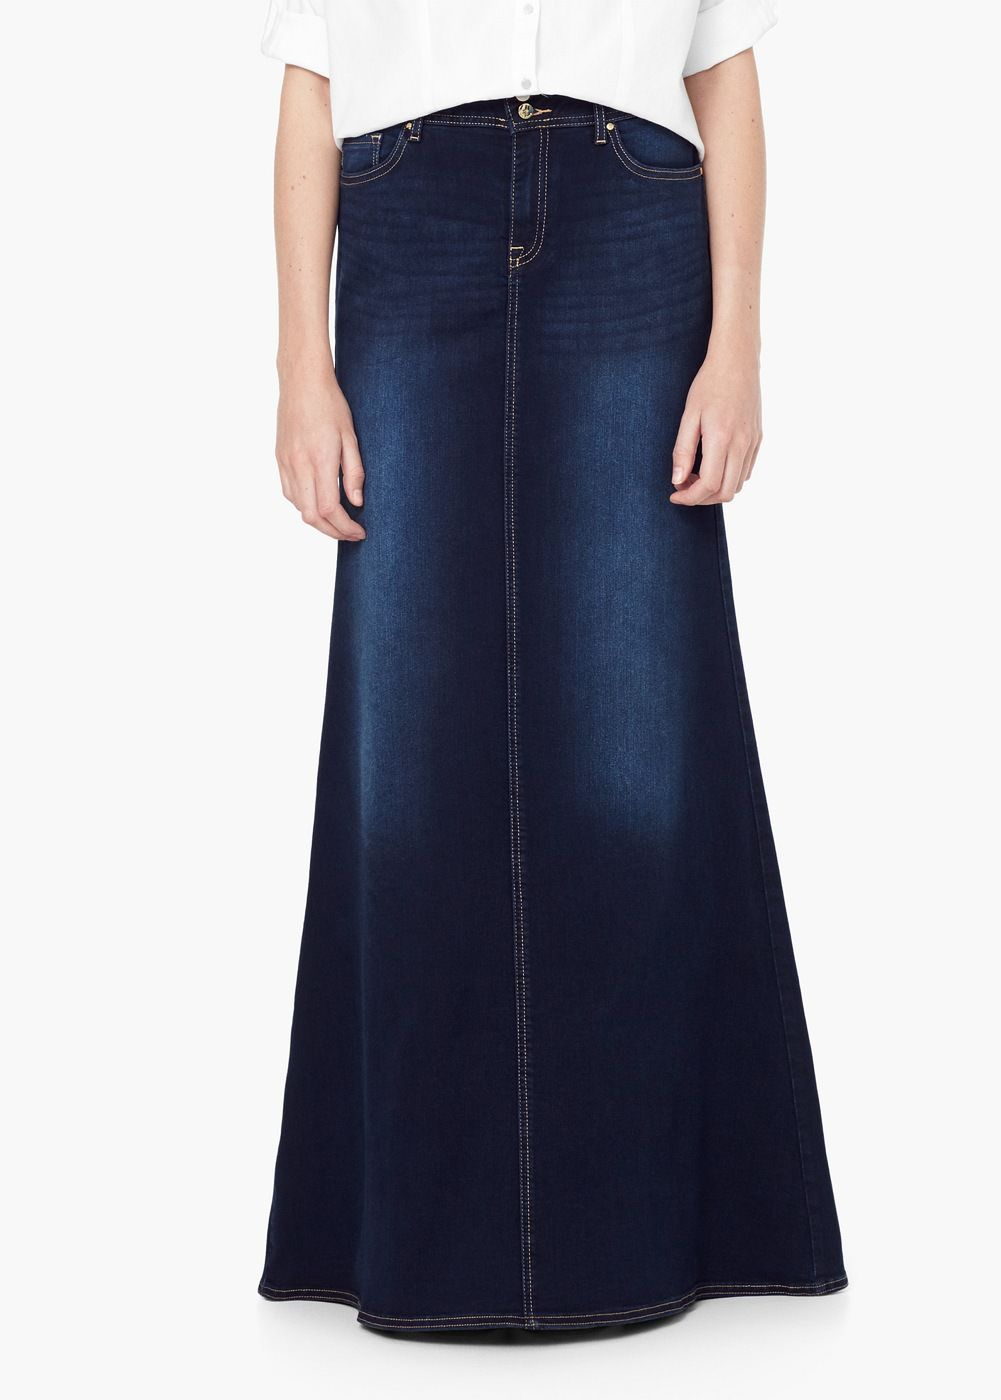 286347029 Falda larga denim - Mujer en 2019 | F@LD@S | Faldas de jean largas ...